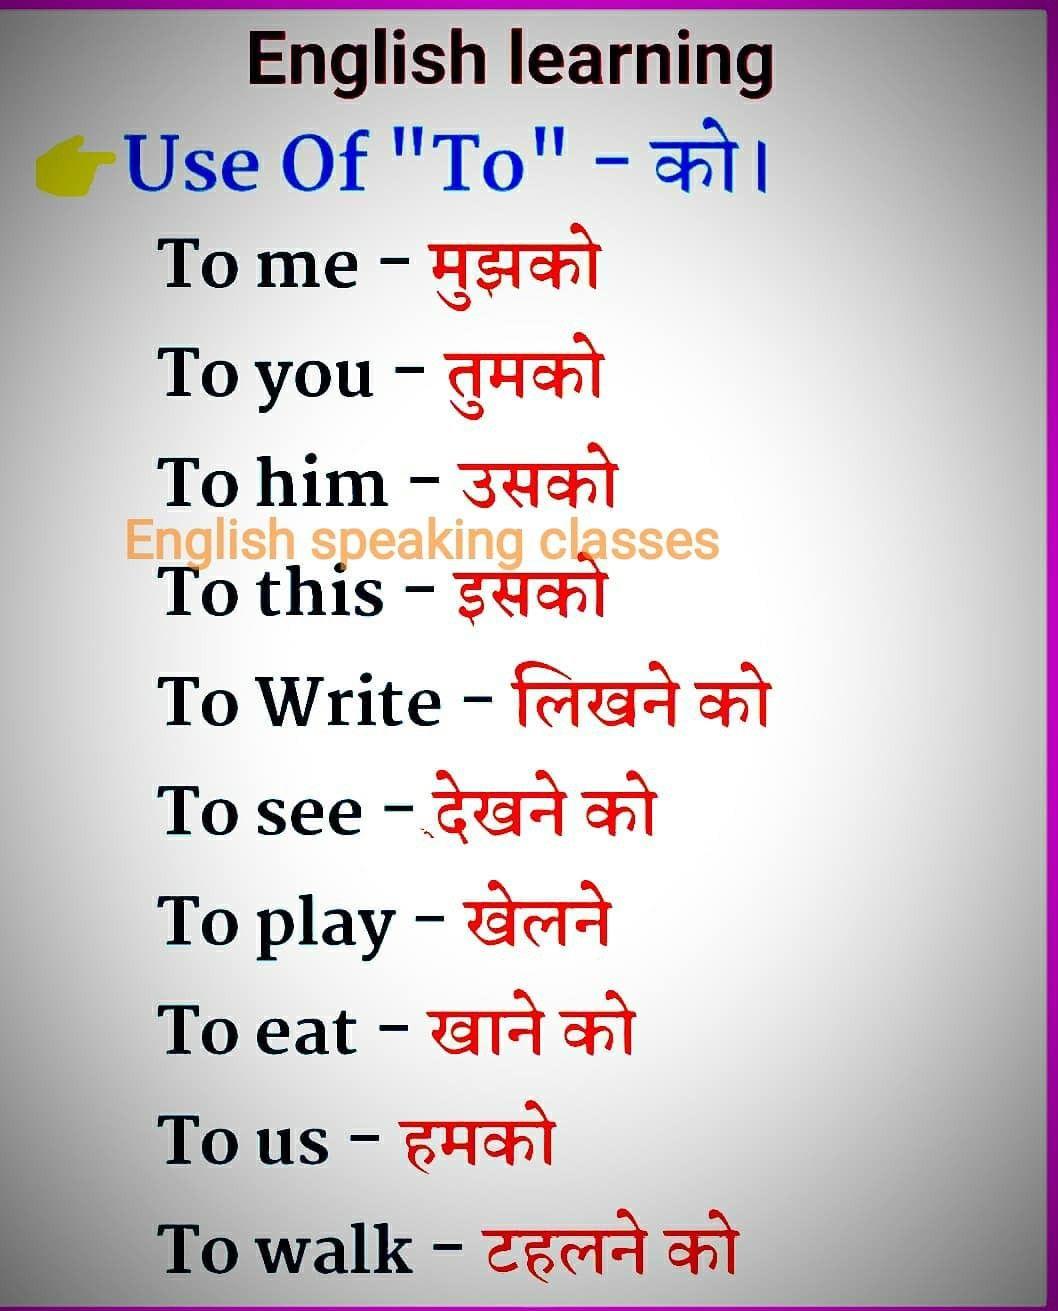 Pin By Sunitha On Hindi Worksheets And Games English Vocabulary Words Learning English Vocabulary Words Good Vocabulary Words [ 1311 x 1058 Pixel ]